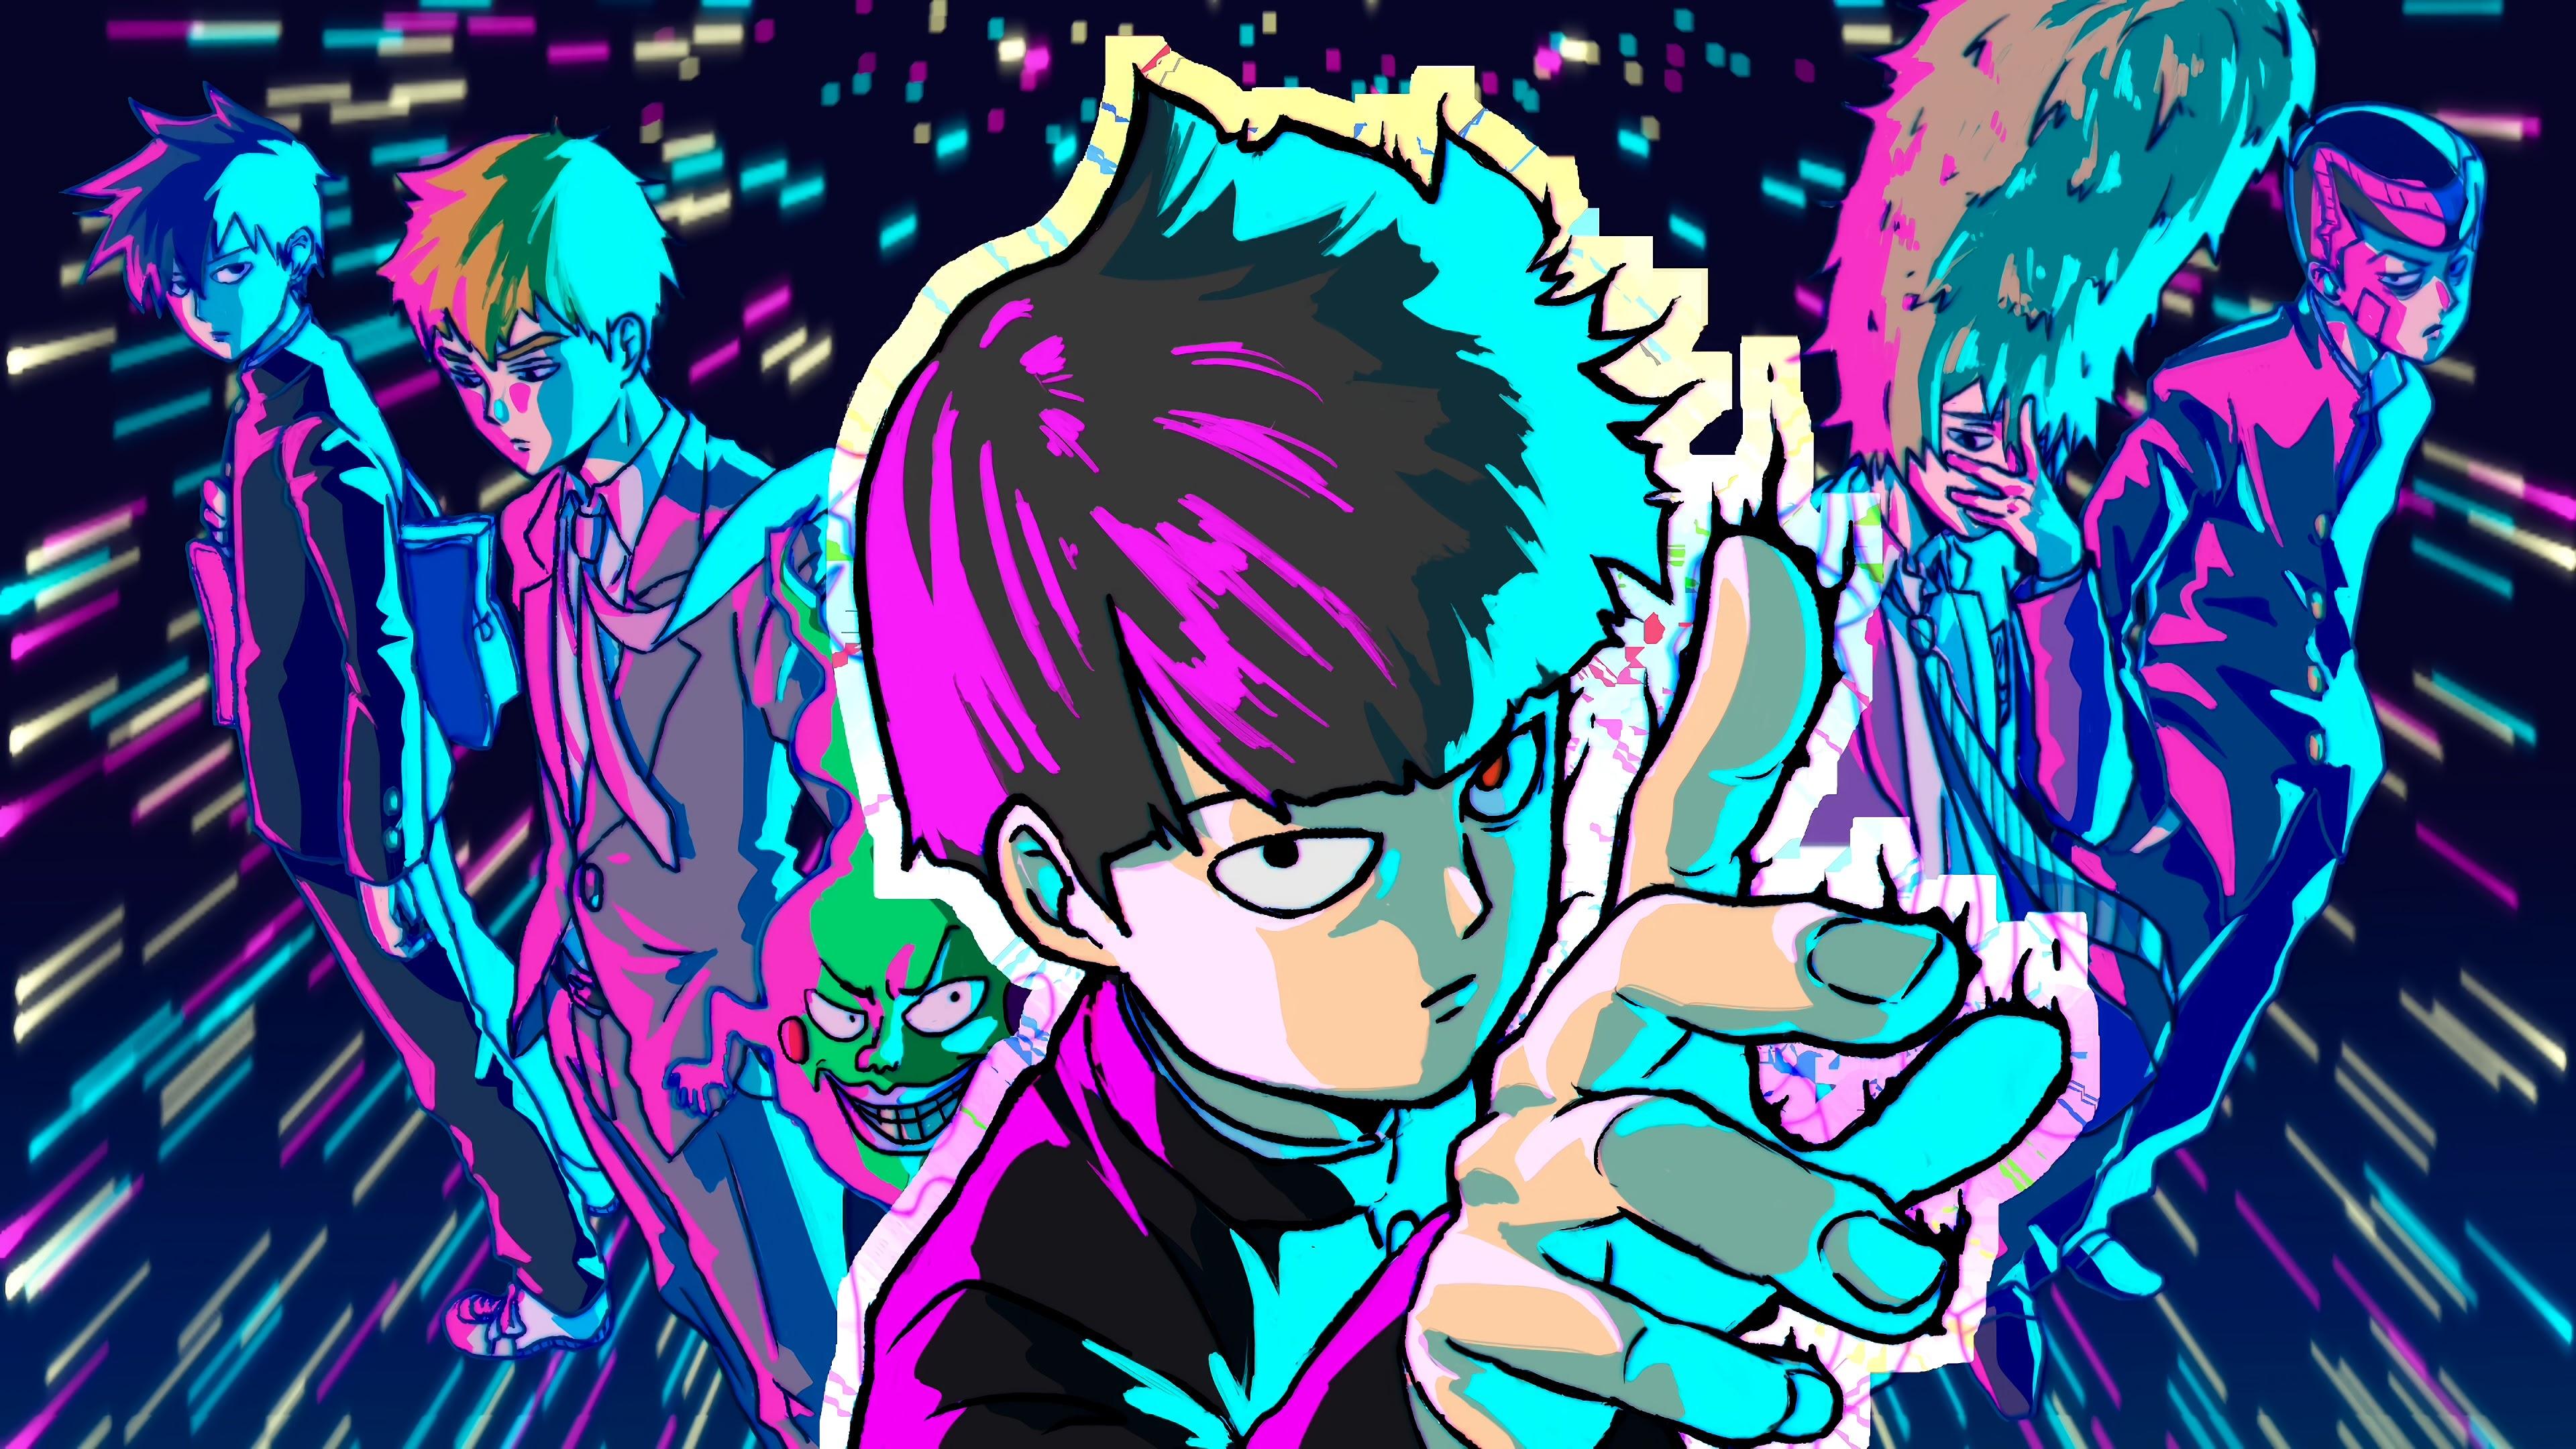 Mob Psycho 100 Anime Characters 4k 3840x2160 Wallpaper 26